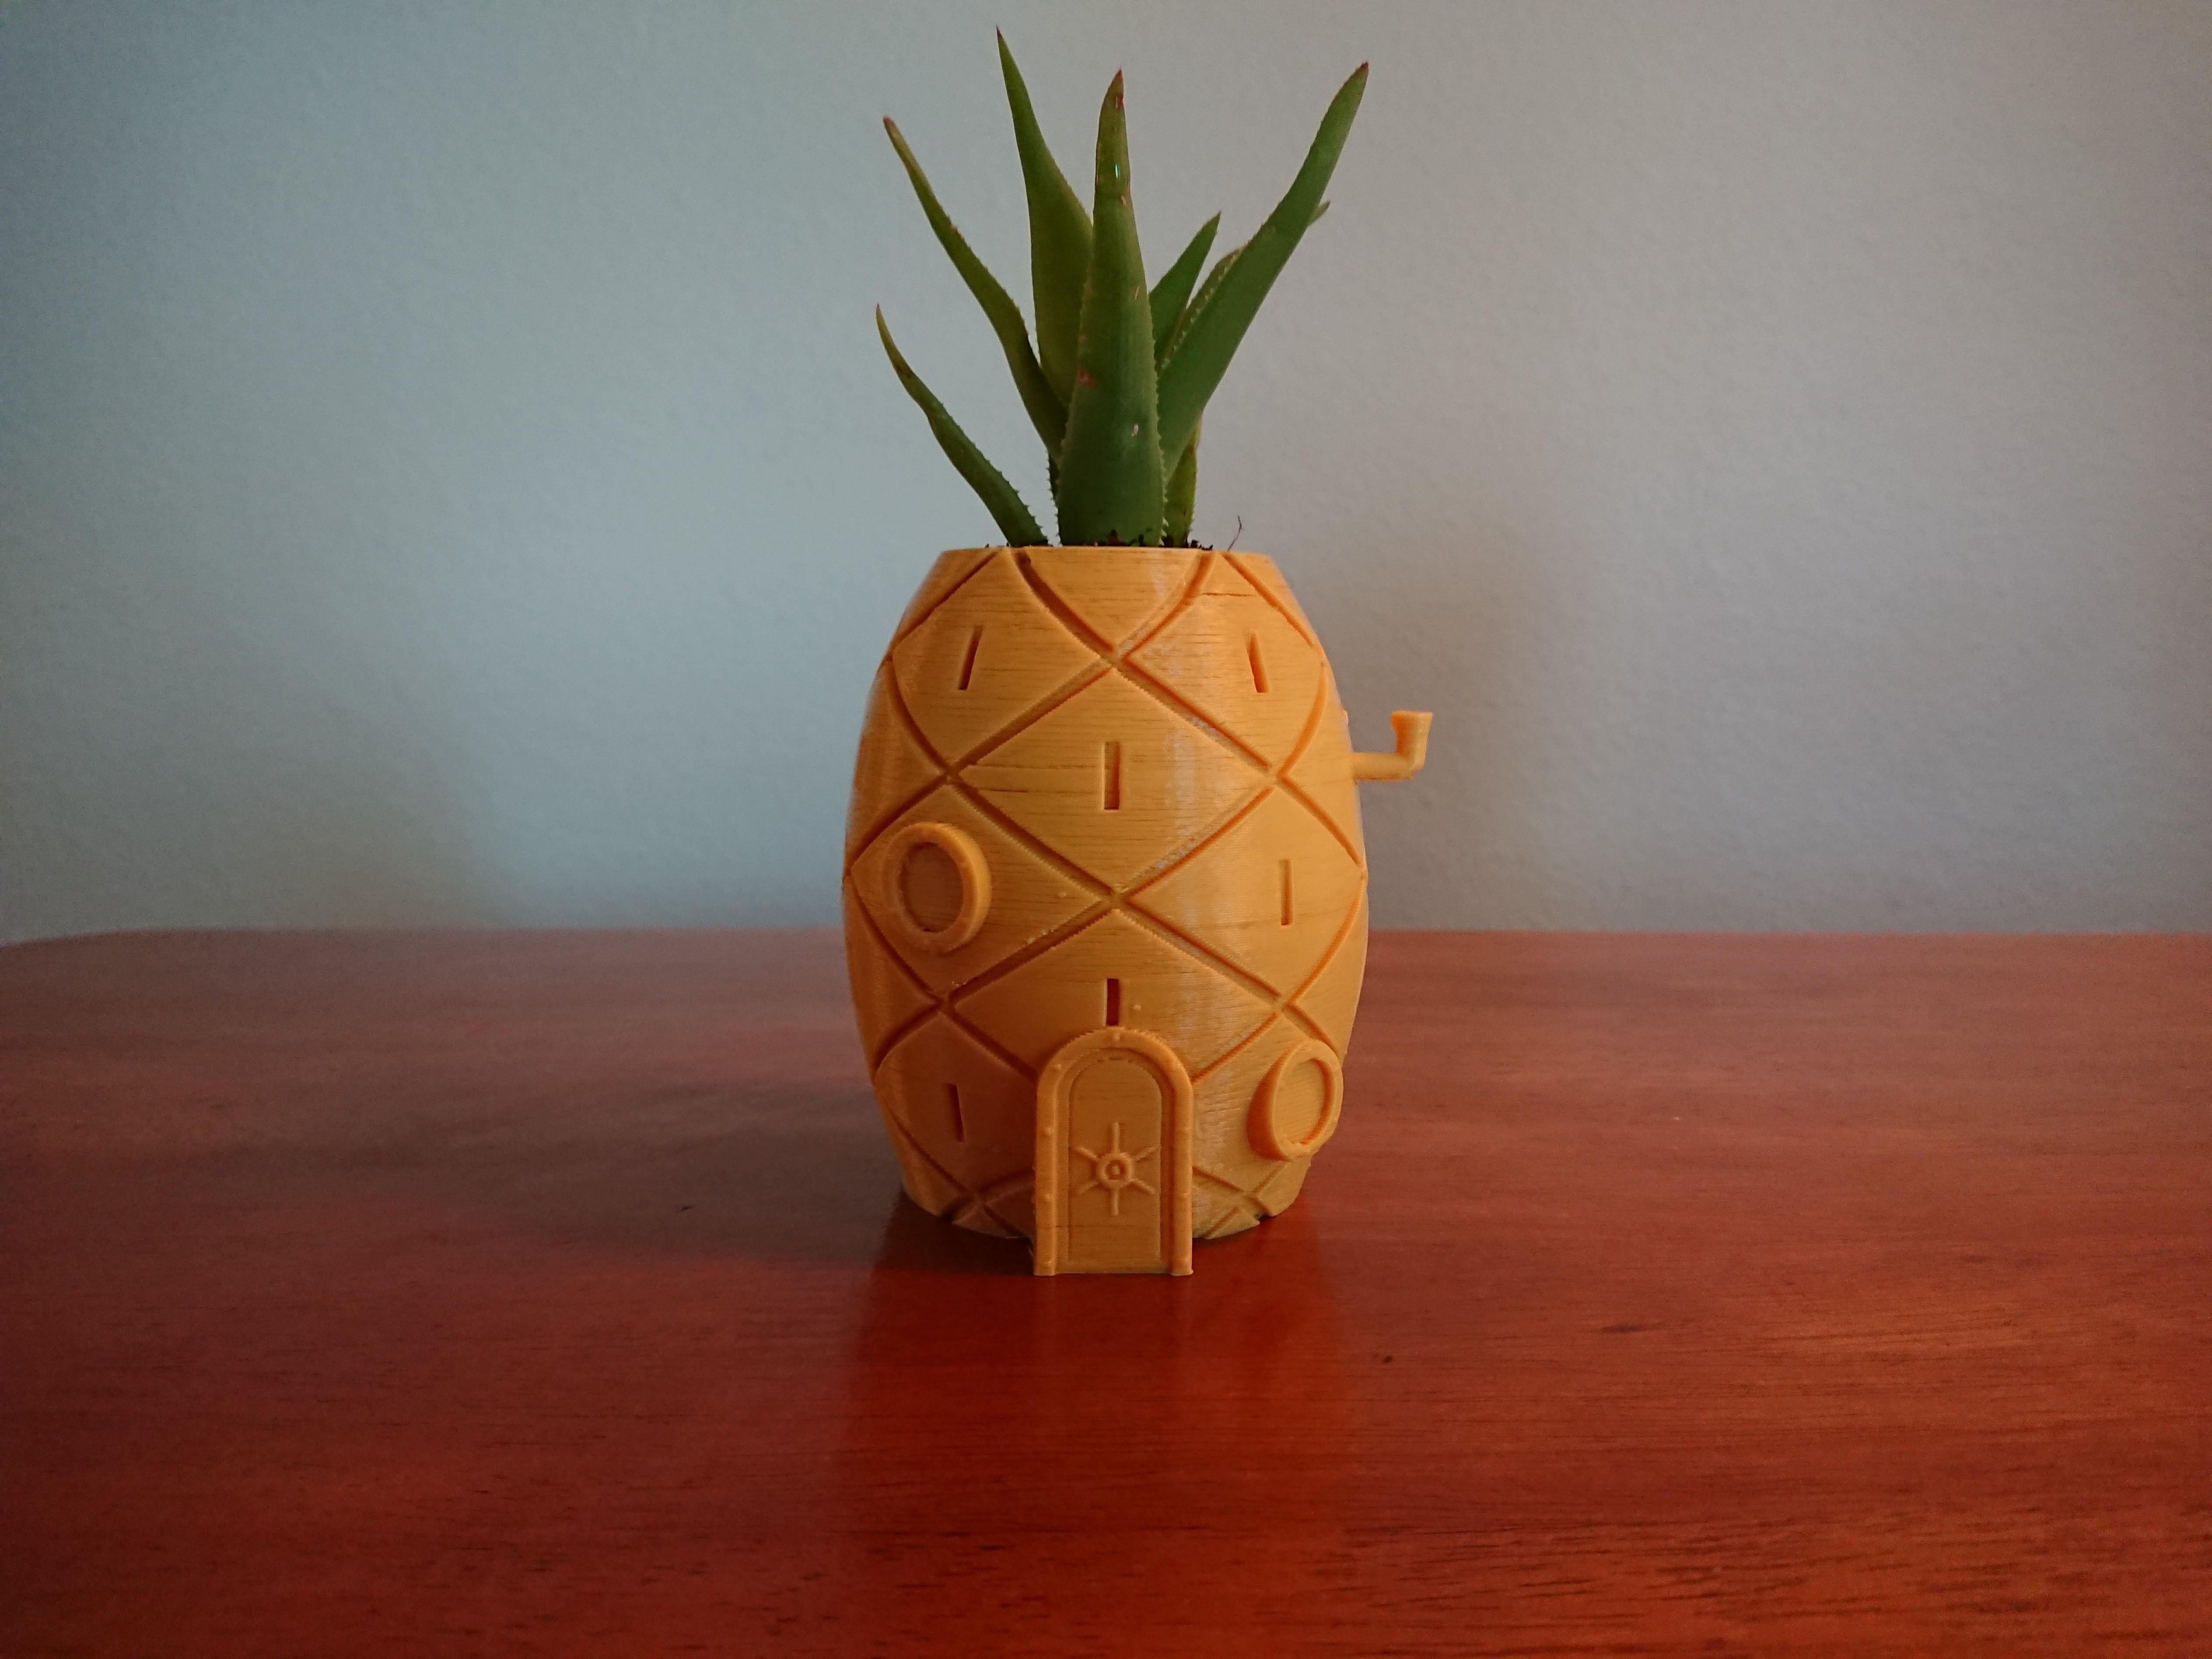 DSC_0113.jpg Download free STL file Spongebob's House Plant Pot • 3D printer template, reno77